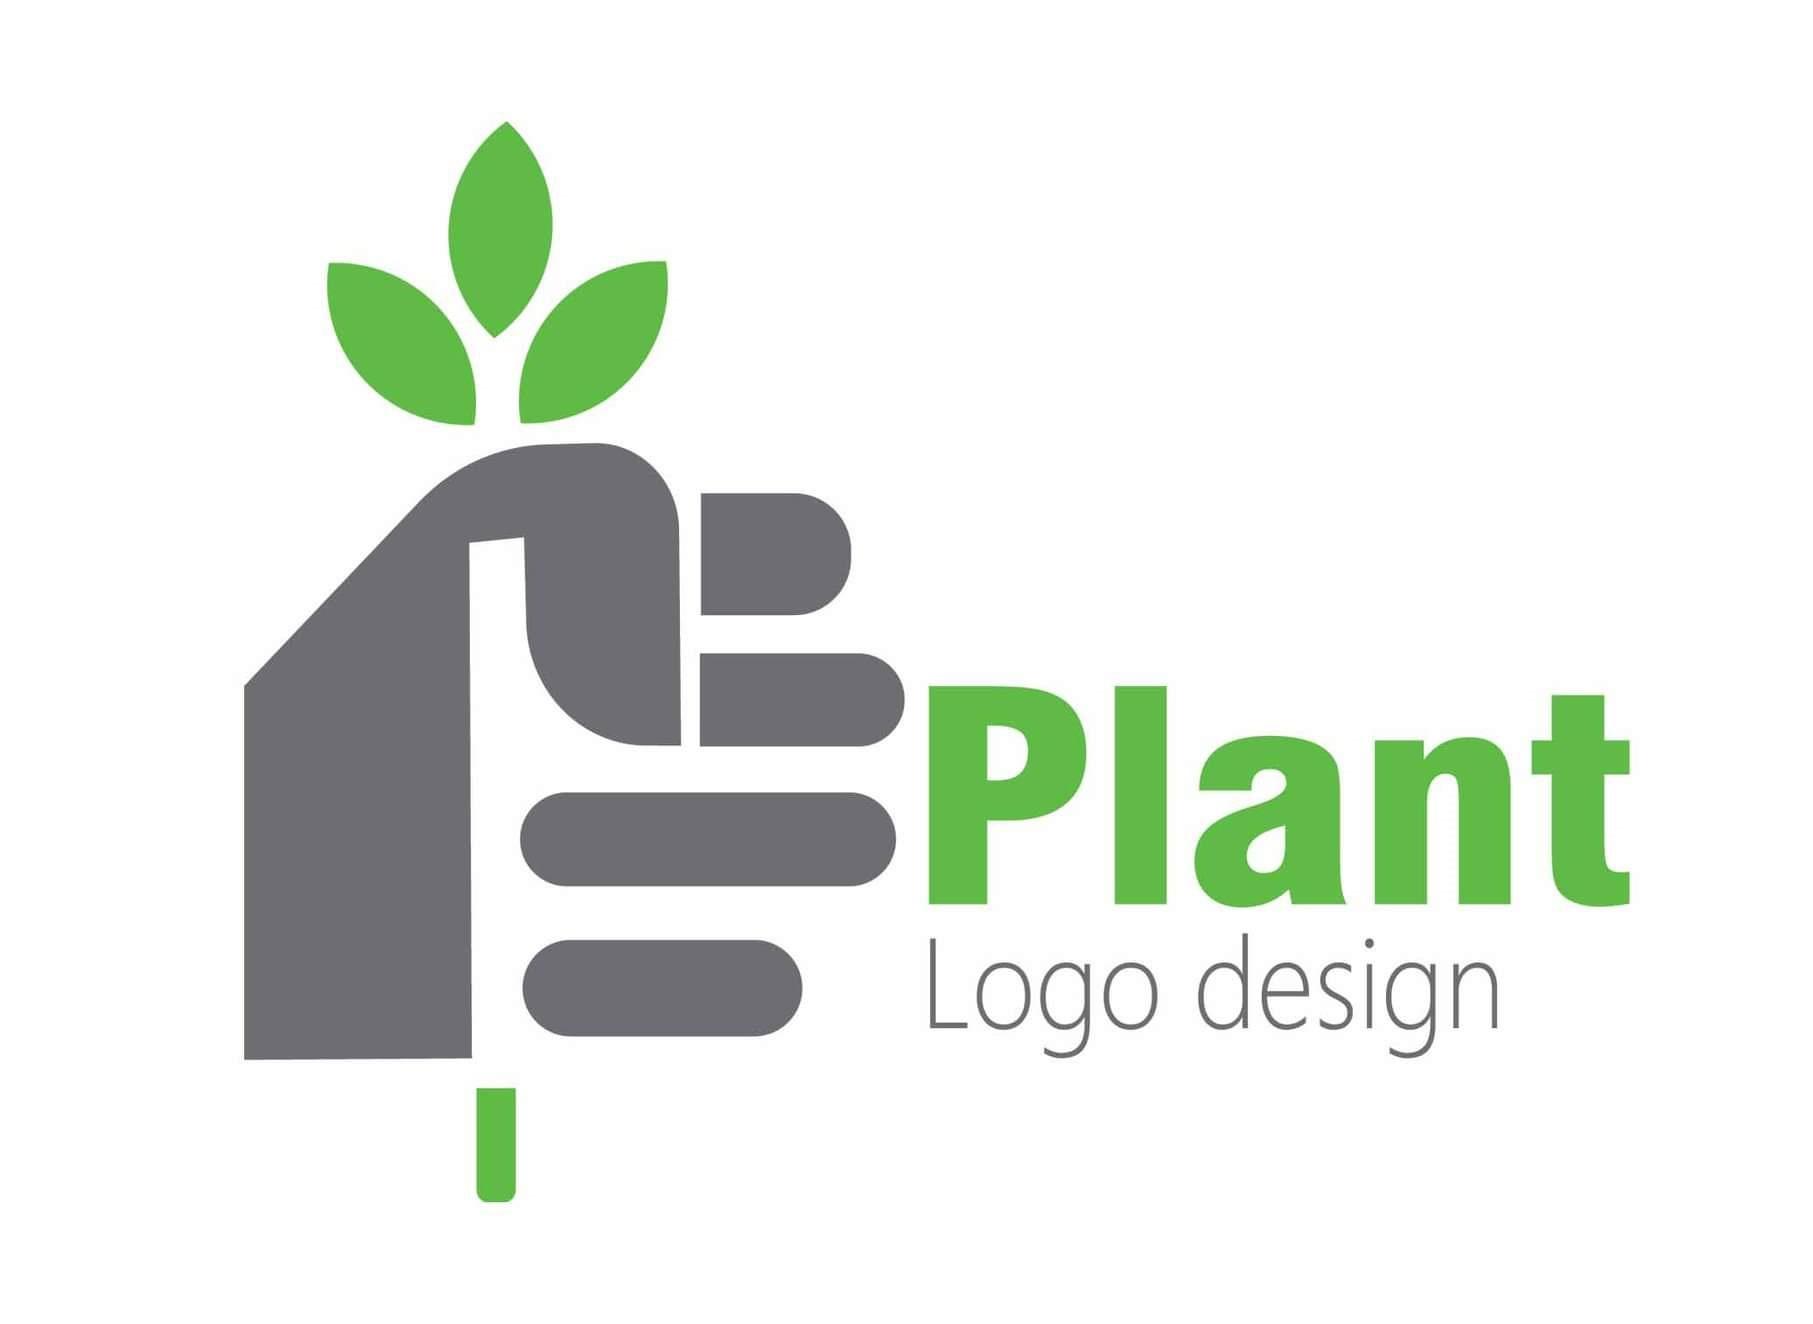 CREATIVE DESIGN ART FOR LOGO DESIGN,  IMAGE EIDING WORK,  GRAPHICS DESIGN, PDF EDITING WORK, TYPING